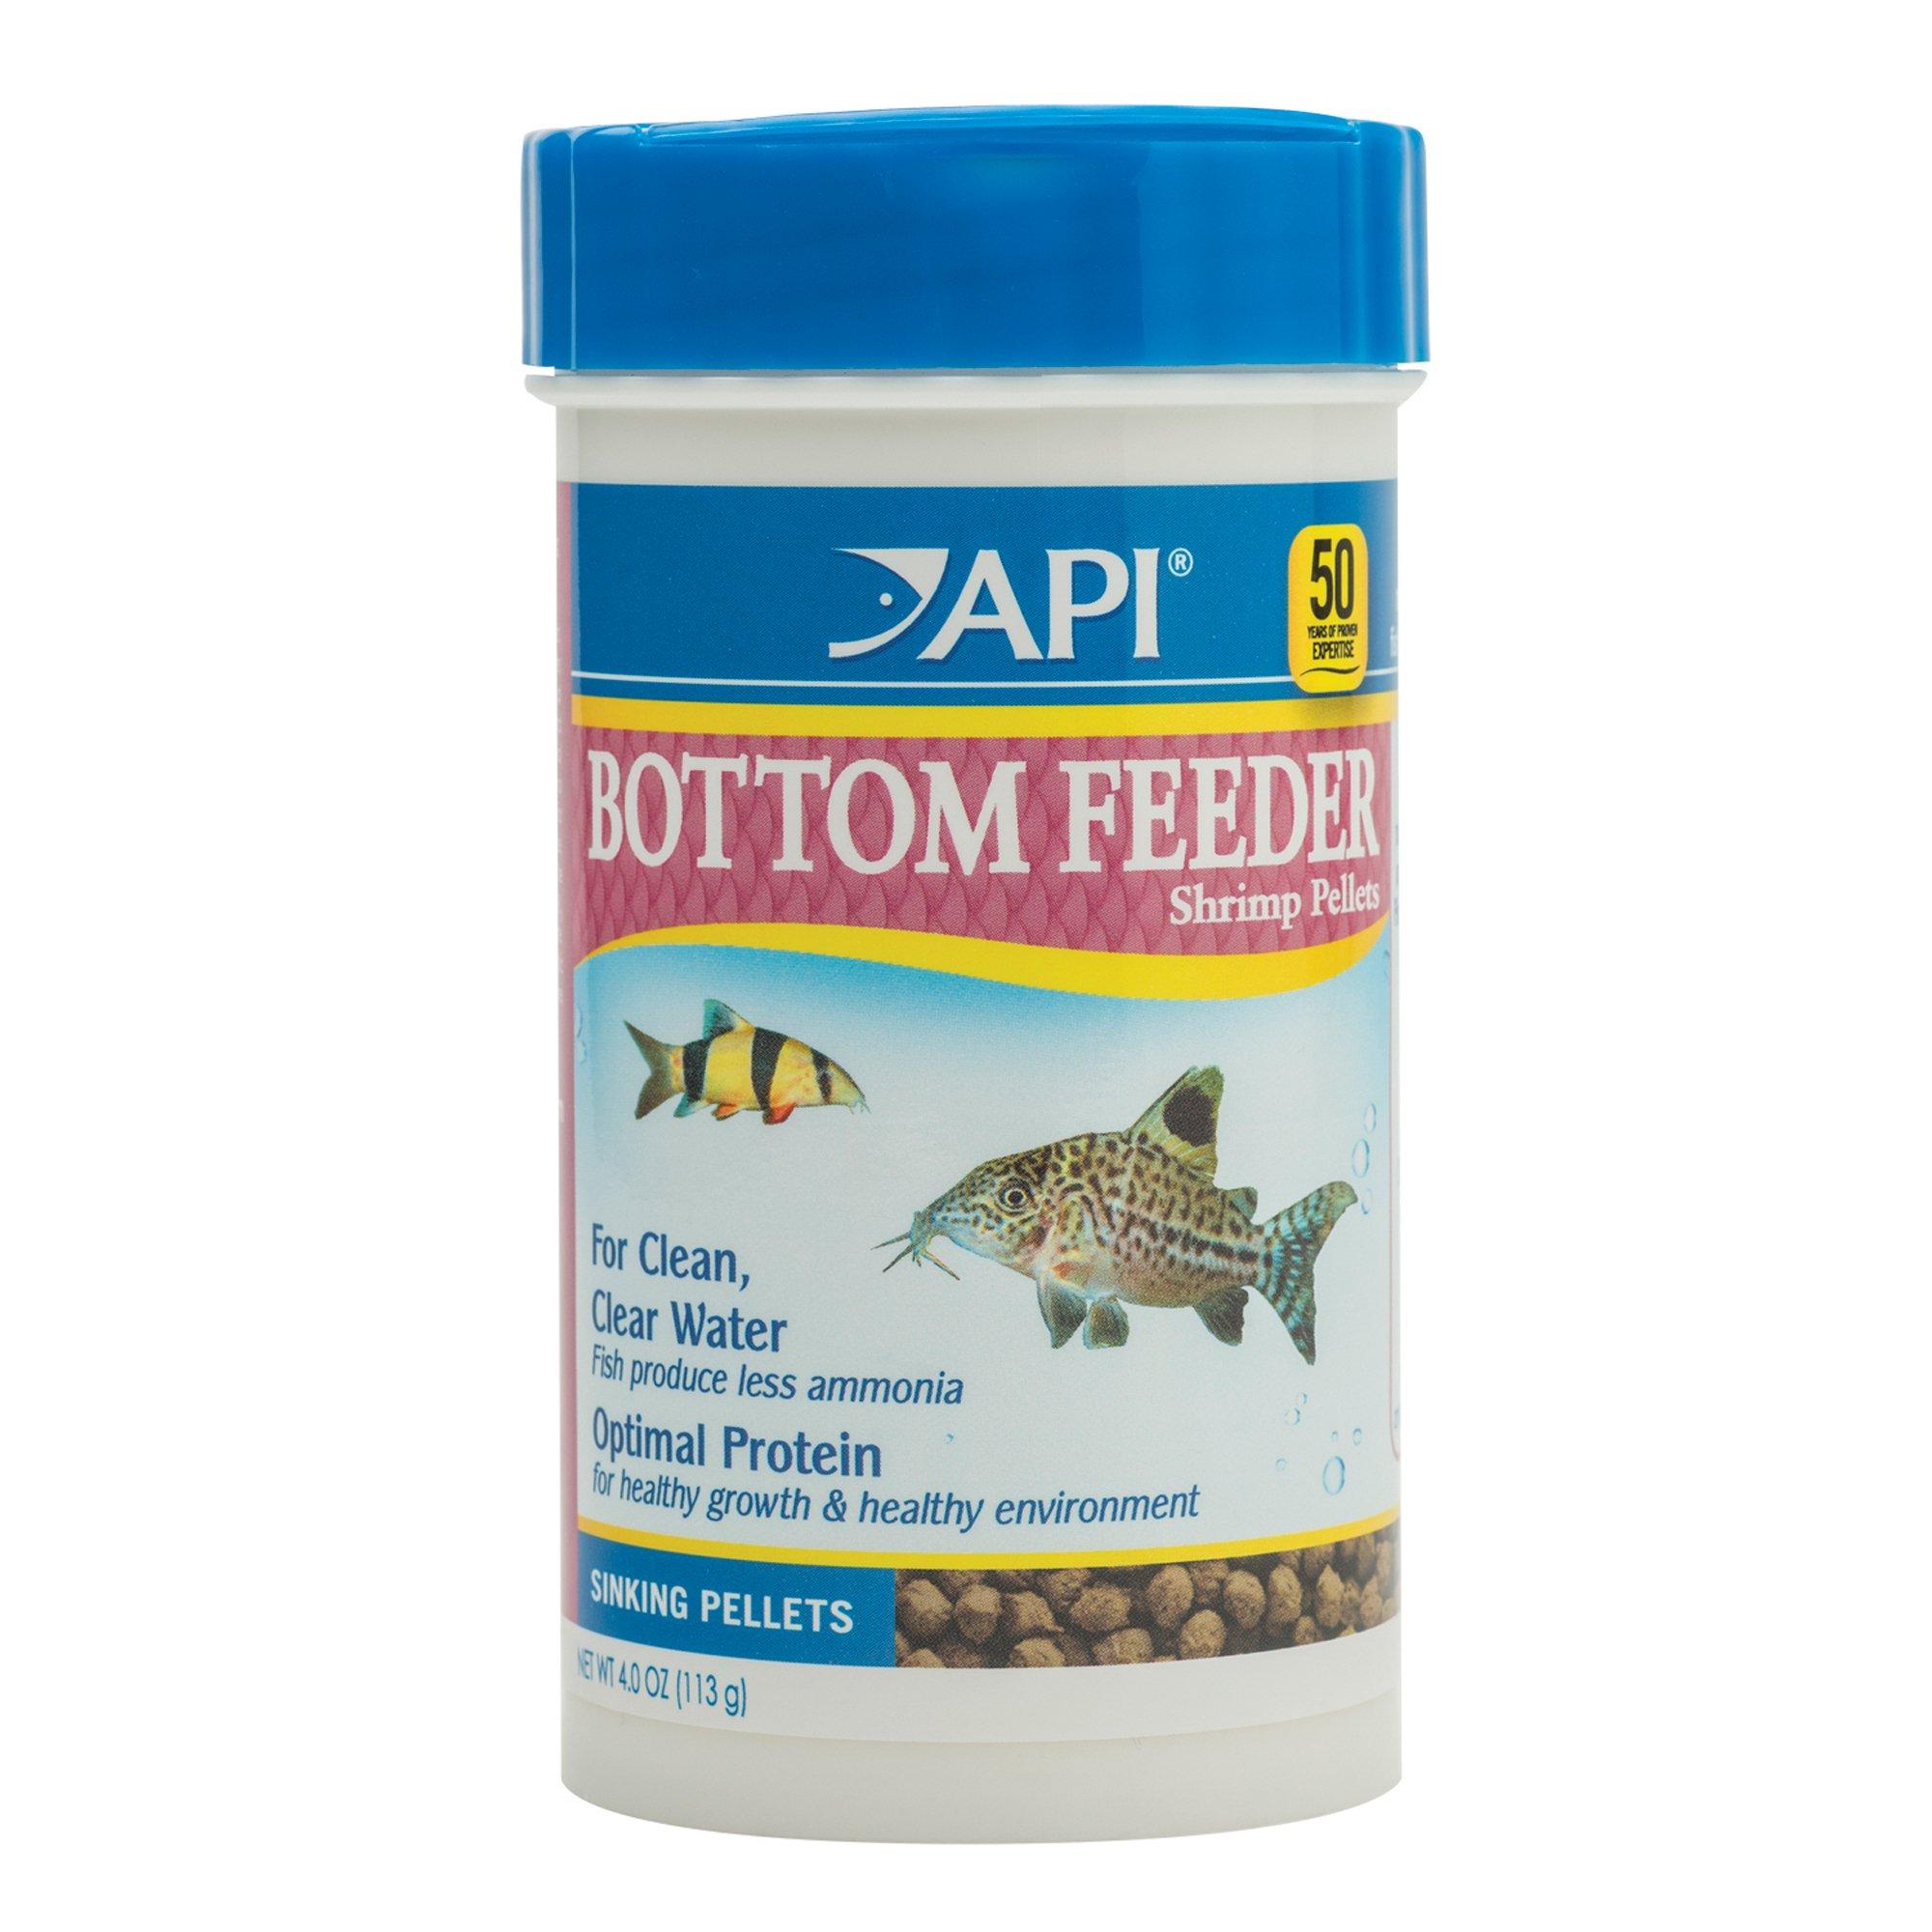 Api bottom feeder shrimp pellets fish food petco for Feeder fish petco